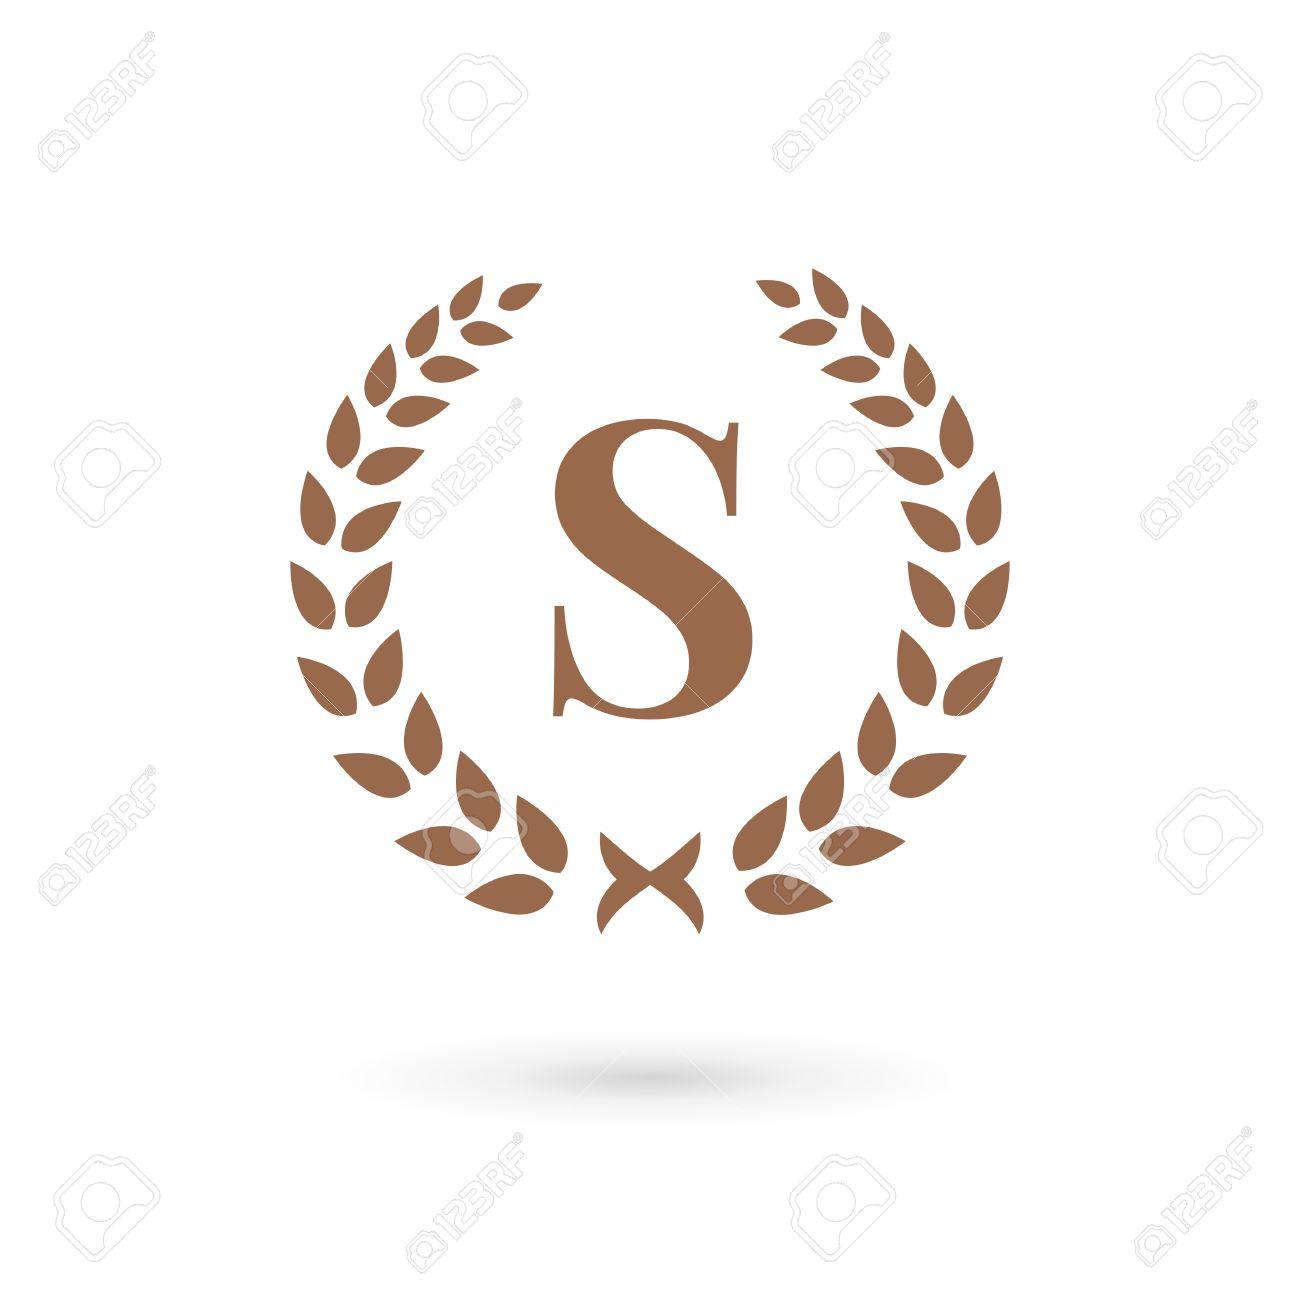 Letter s laurel wreath logo icon design template elements royalty letter s laurel wreath logo icon design template elements stock vector 33317499 altavistaventures Image collections